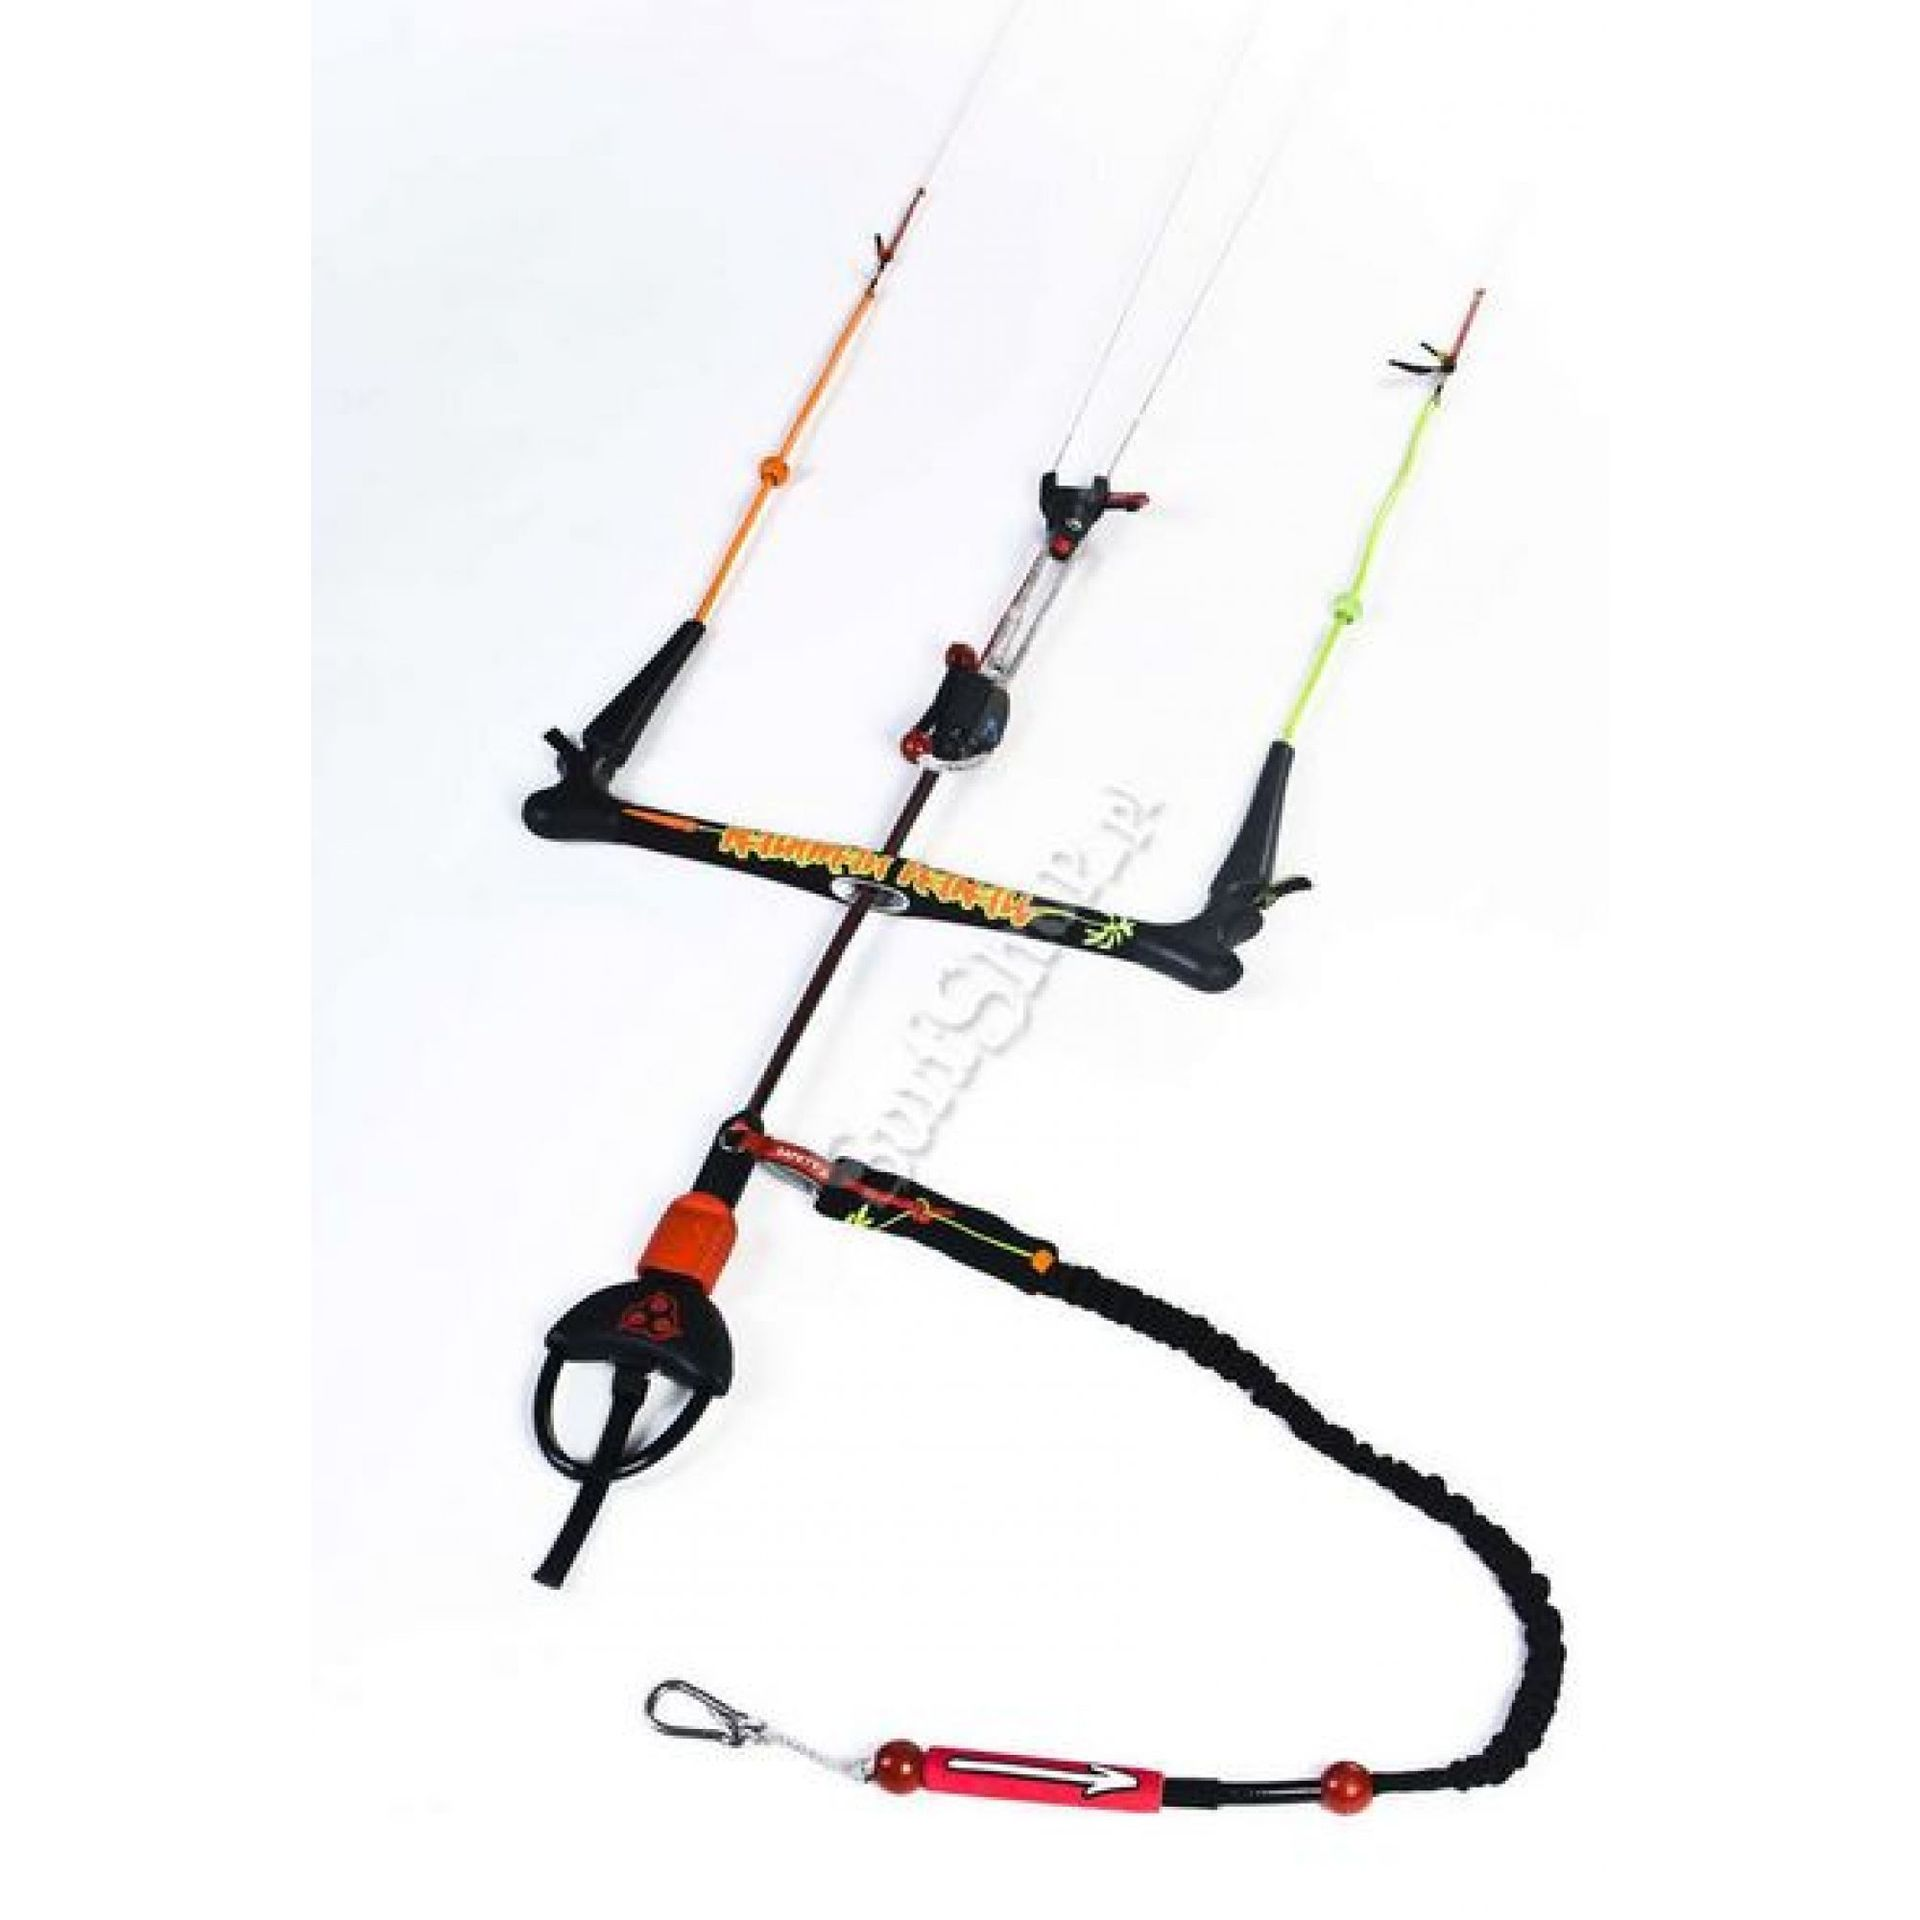 Leash do kite Wainman Hawaii Leash 2.0  (3)